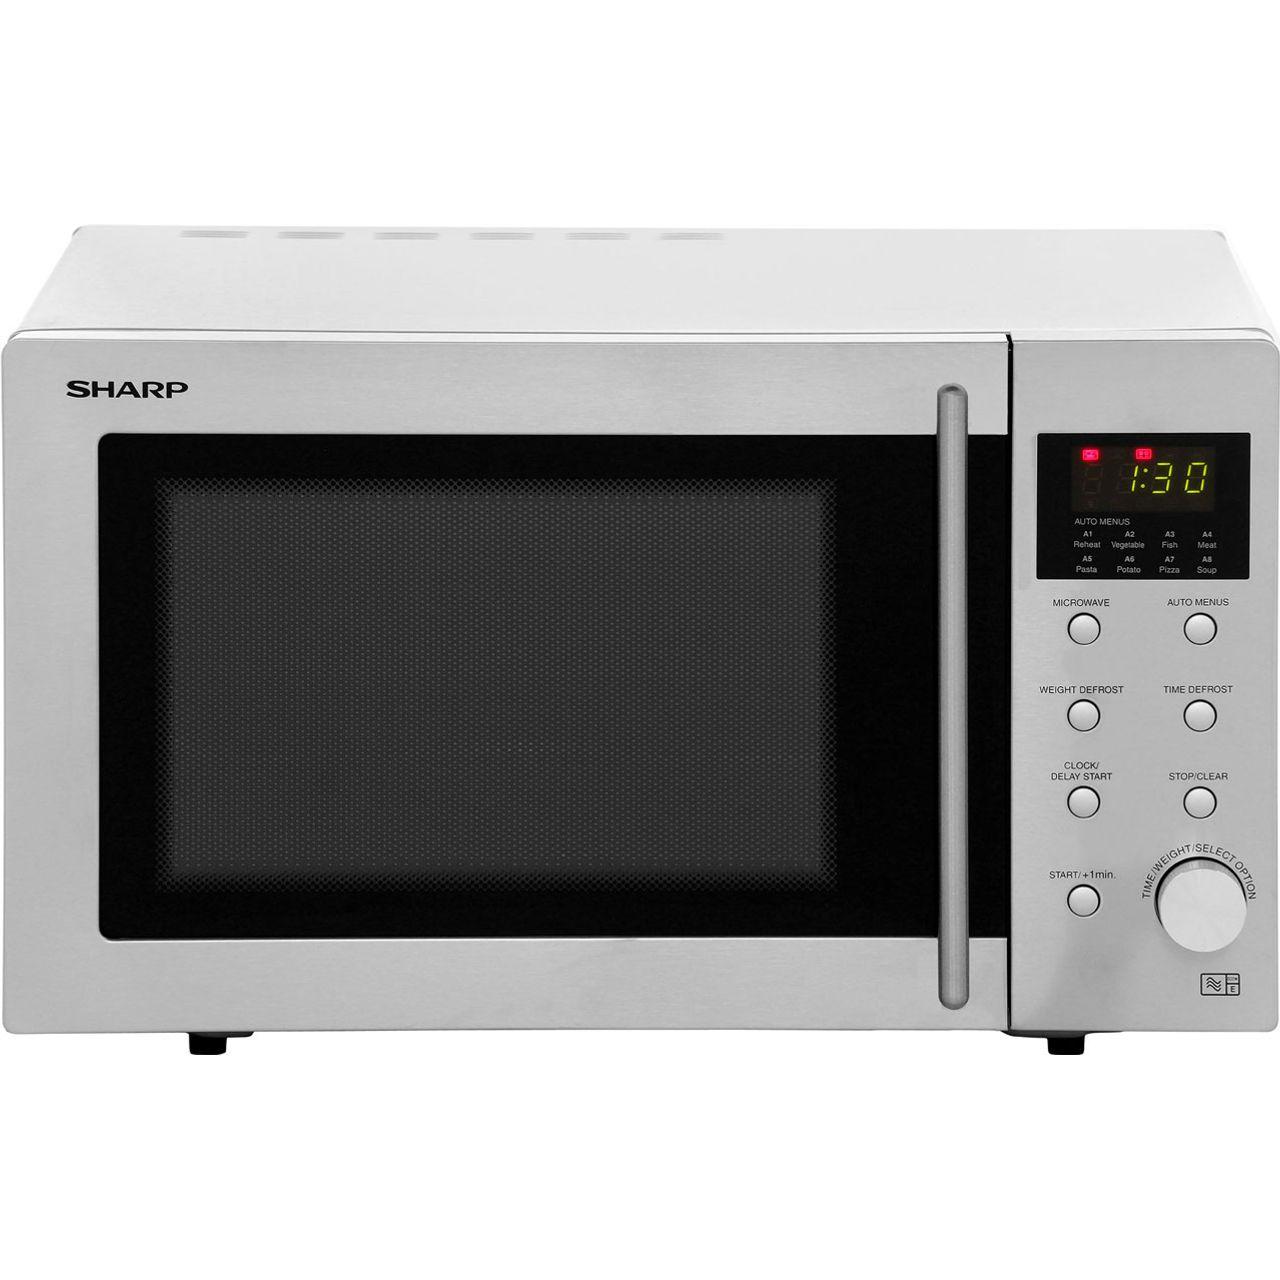 sharp microwave r28stm 800 watt microwave free standing. Black Bedroom Furniture Sets. Home Design Ideas